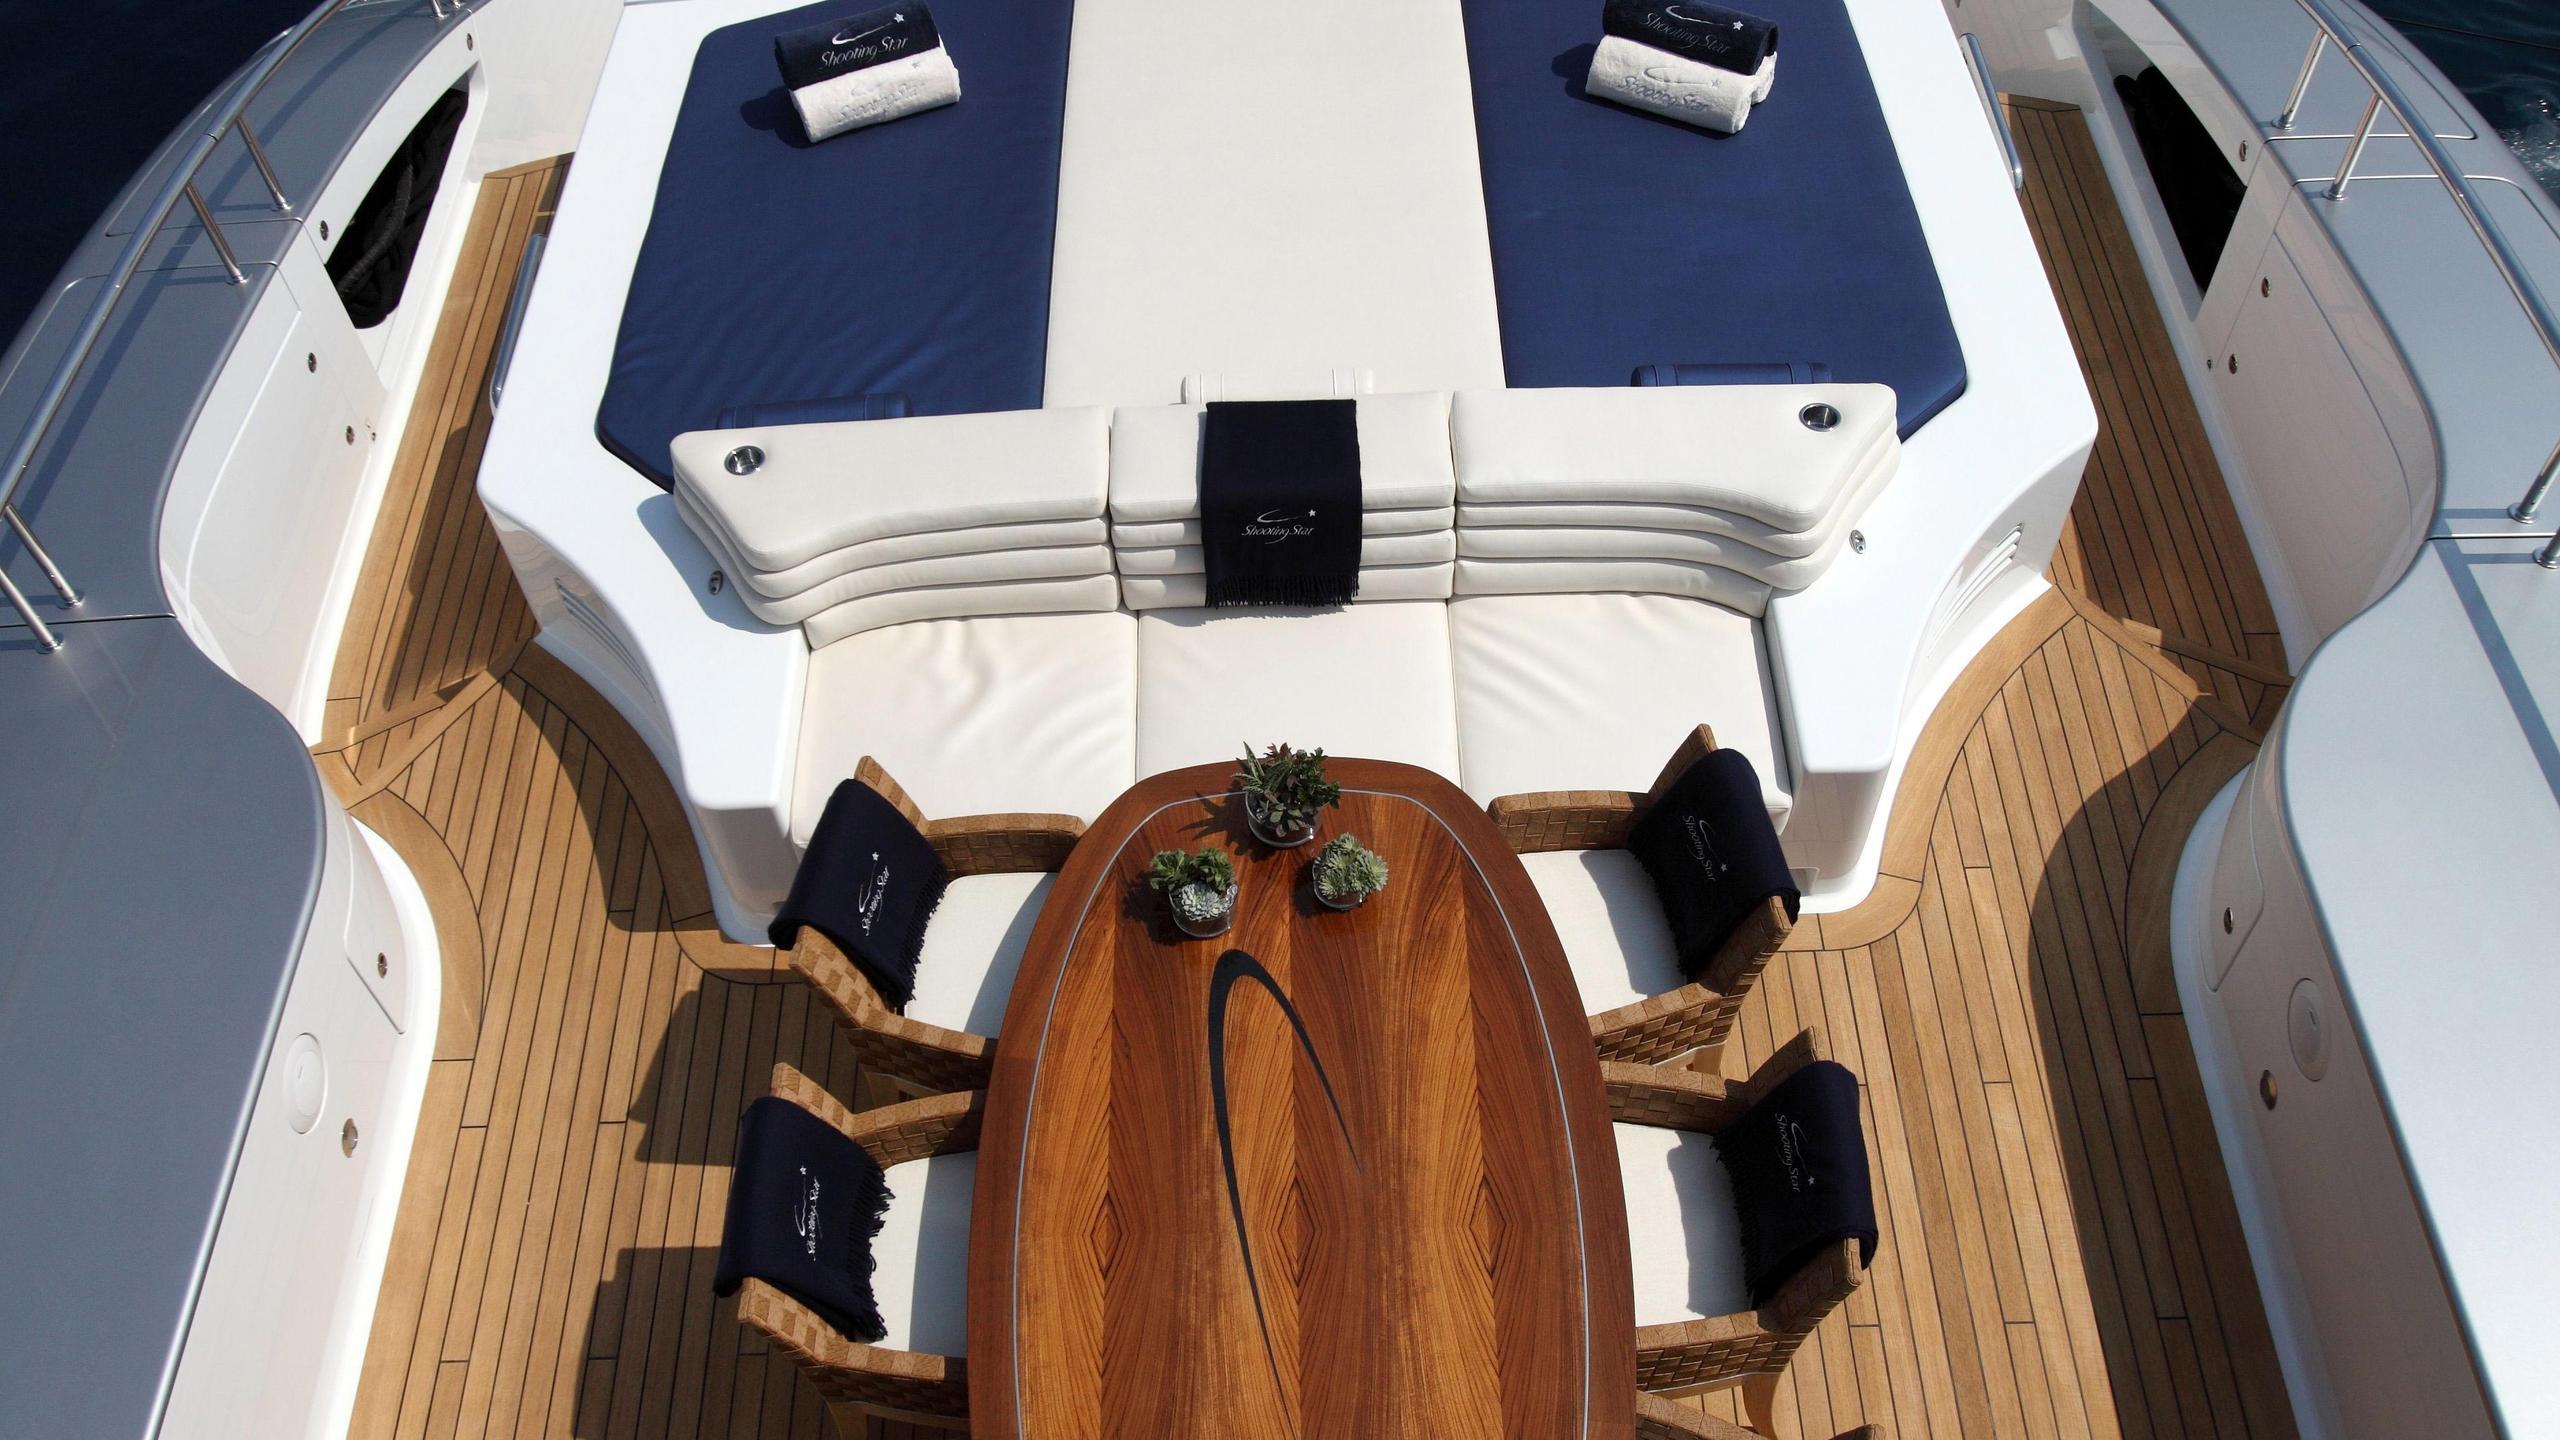 butterfly-motor-yacht-danish-2011-38m-deck-aerial